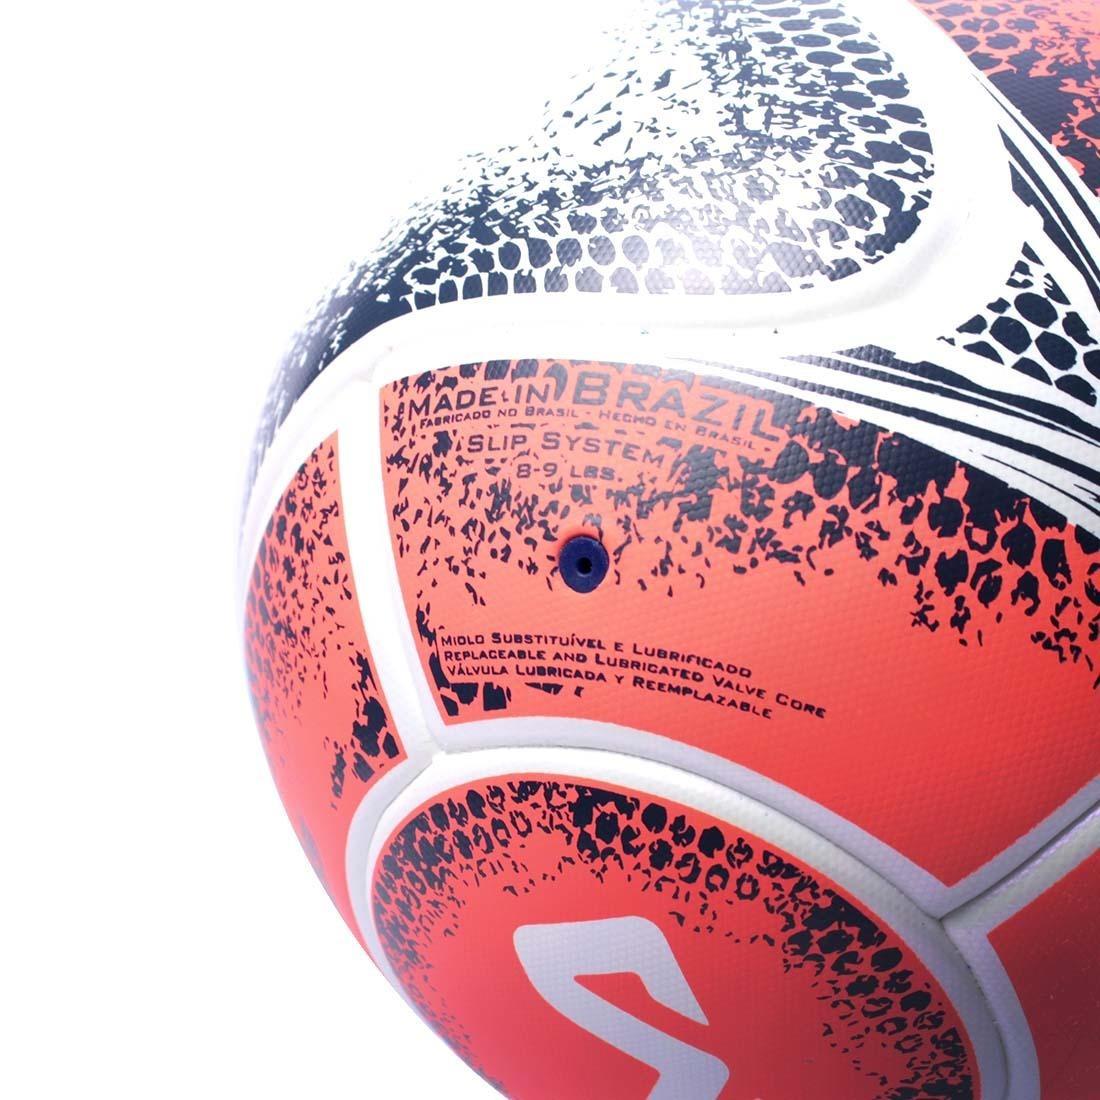 056a2303bce7d bola futsal penalty max 1000 aprovada fifa 2018 original. Carregando zoom.